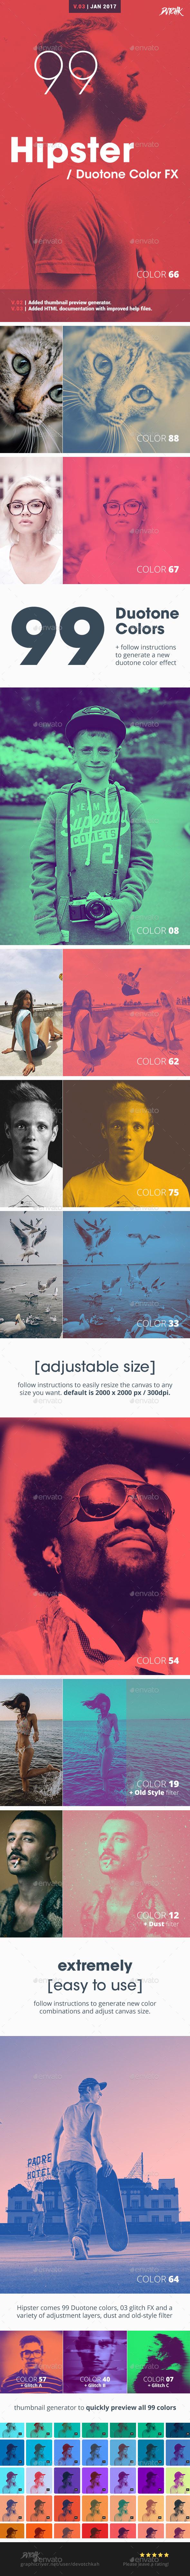 Hipster - Duotone Color FX - Urban Photo Templates